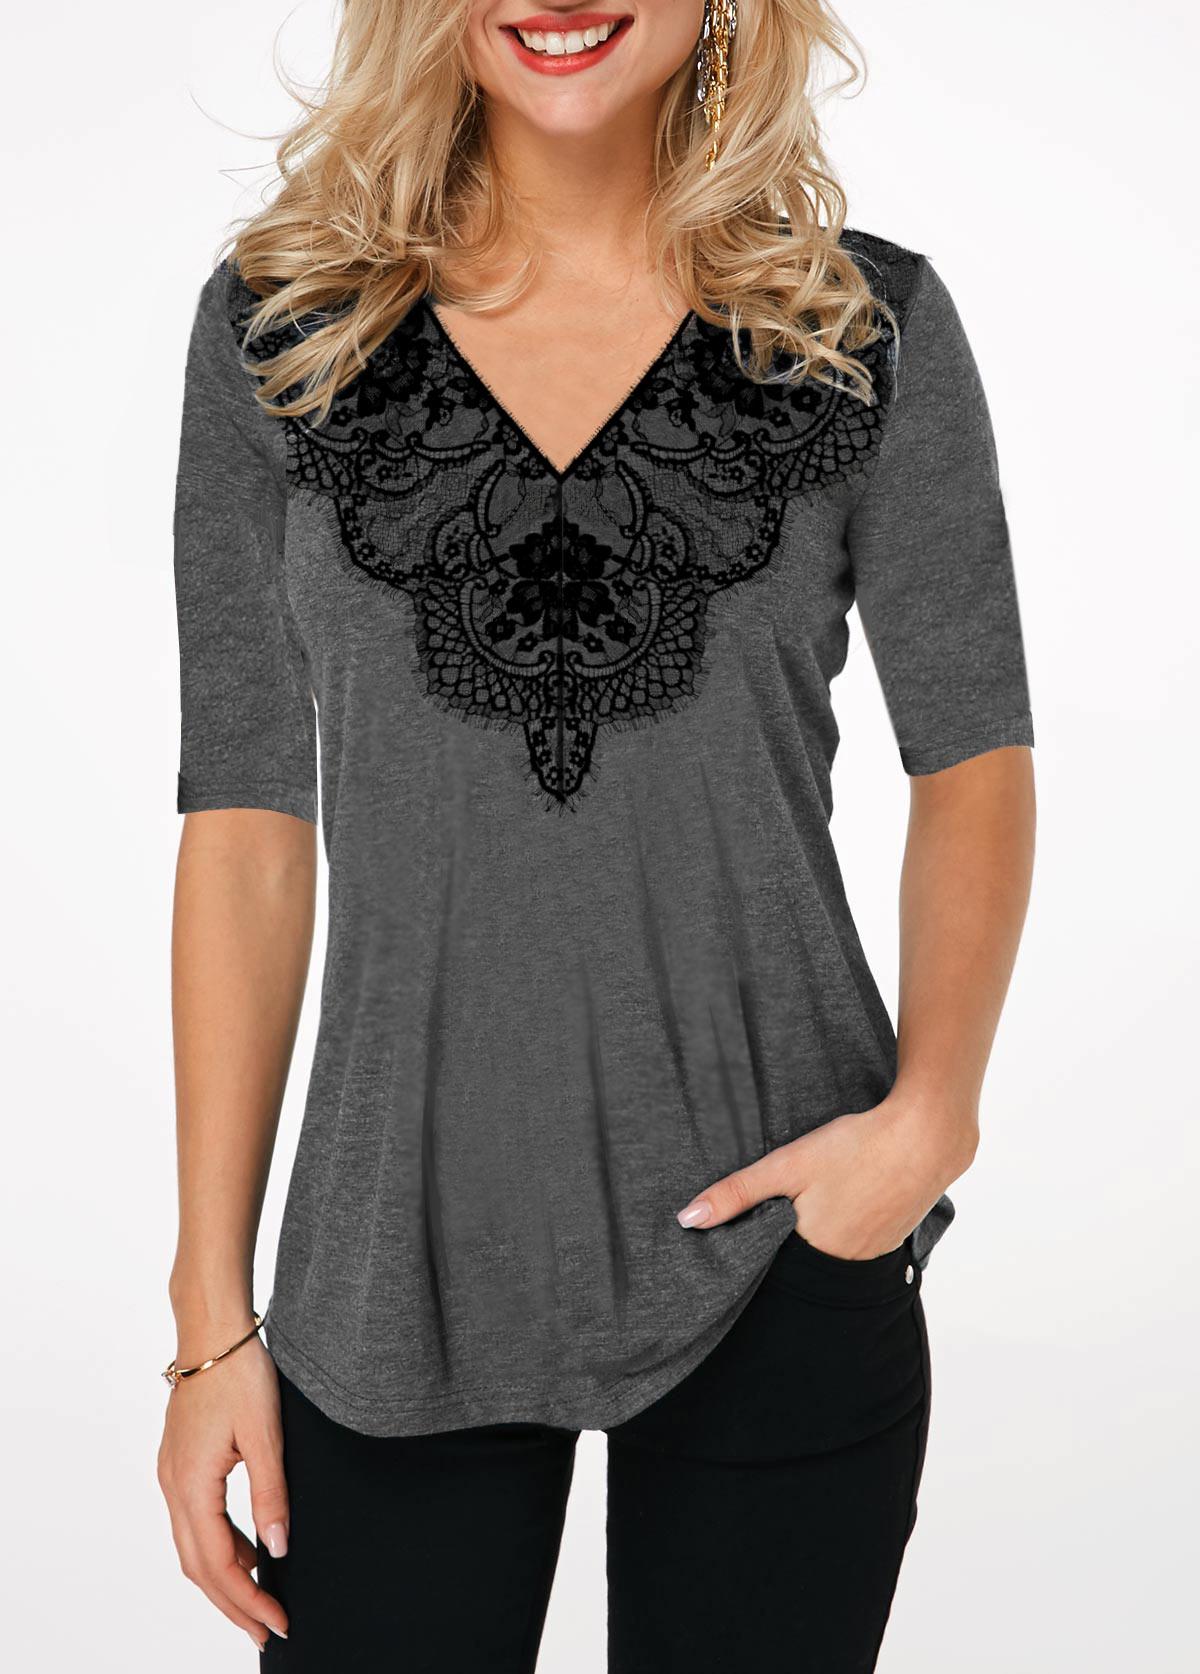 Lace Panel Half Sleeve V Neck T Shirt